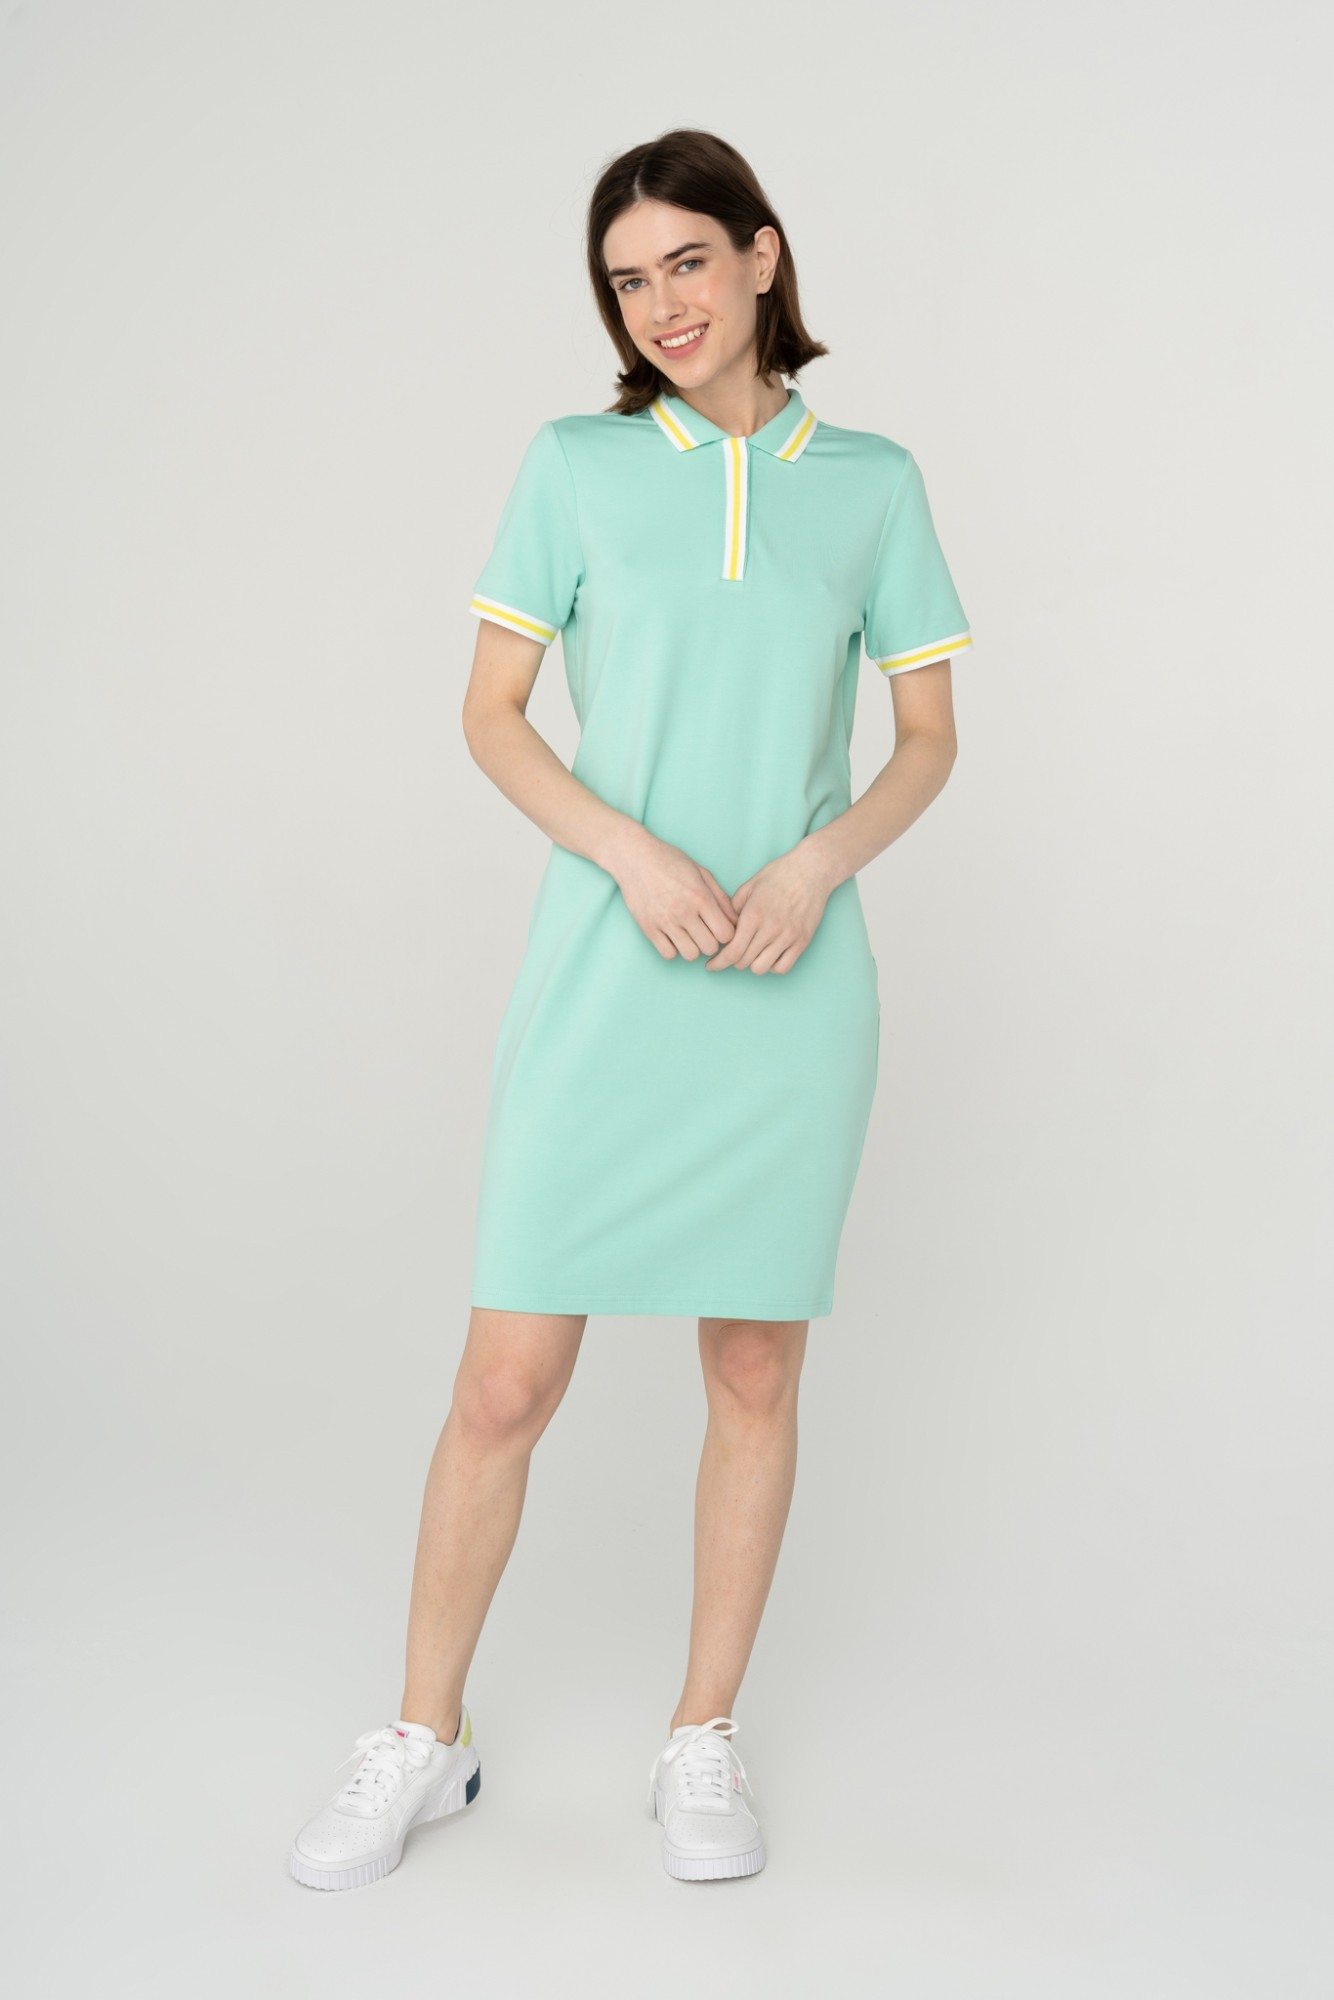 AUDIMAS Švelni modalo polo suknelė 2111-172 Ocean Wave S